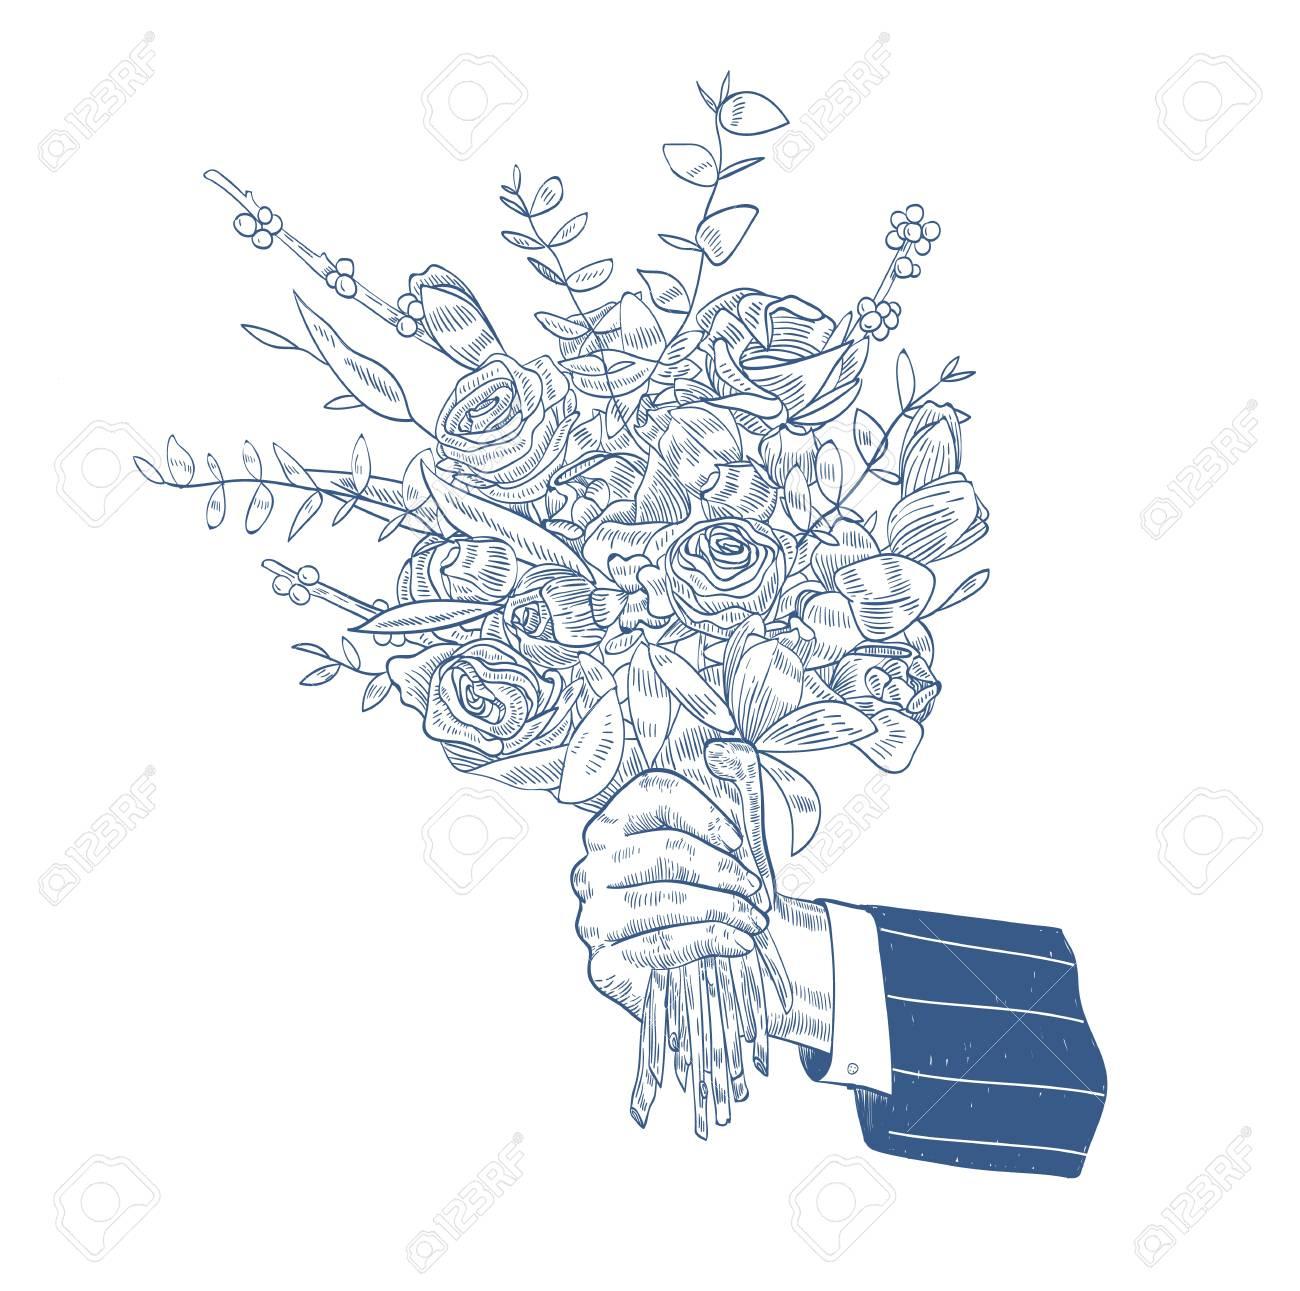 Diagram Of Flower Bunch Wiring Diagram